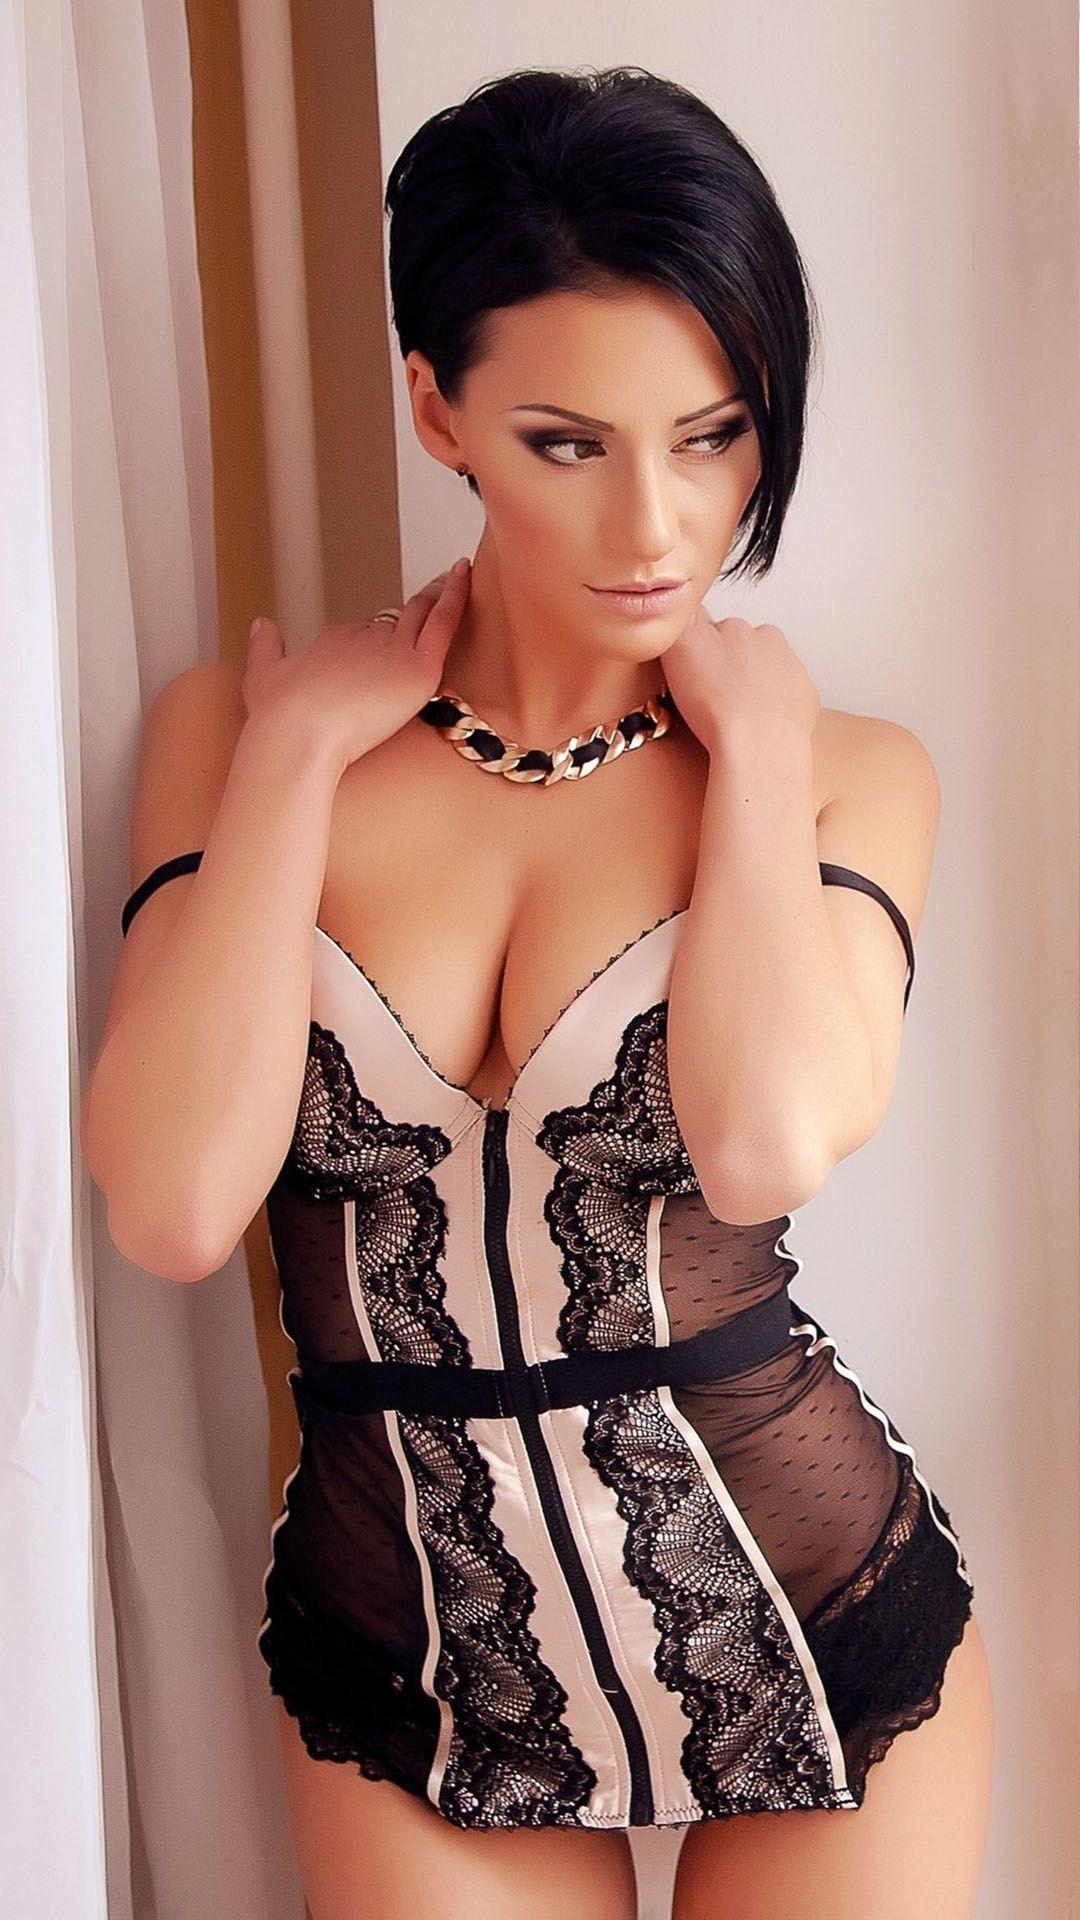 Short big tits lingerie — pic 5